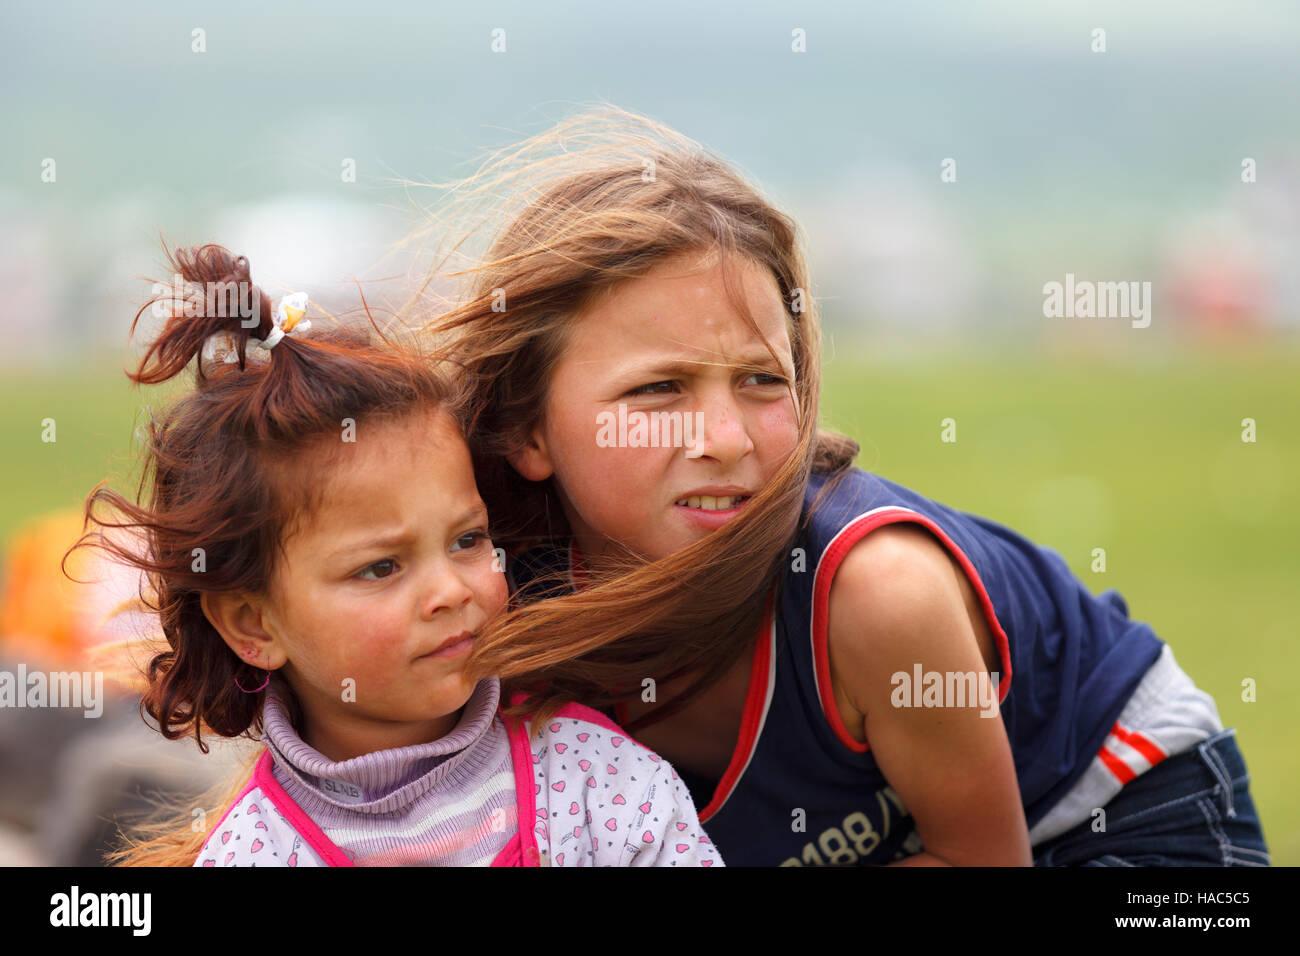 Children of nomadic people in rural areas of Eastern Anatolia.They work as seasonal worker - Stock Image